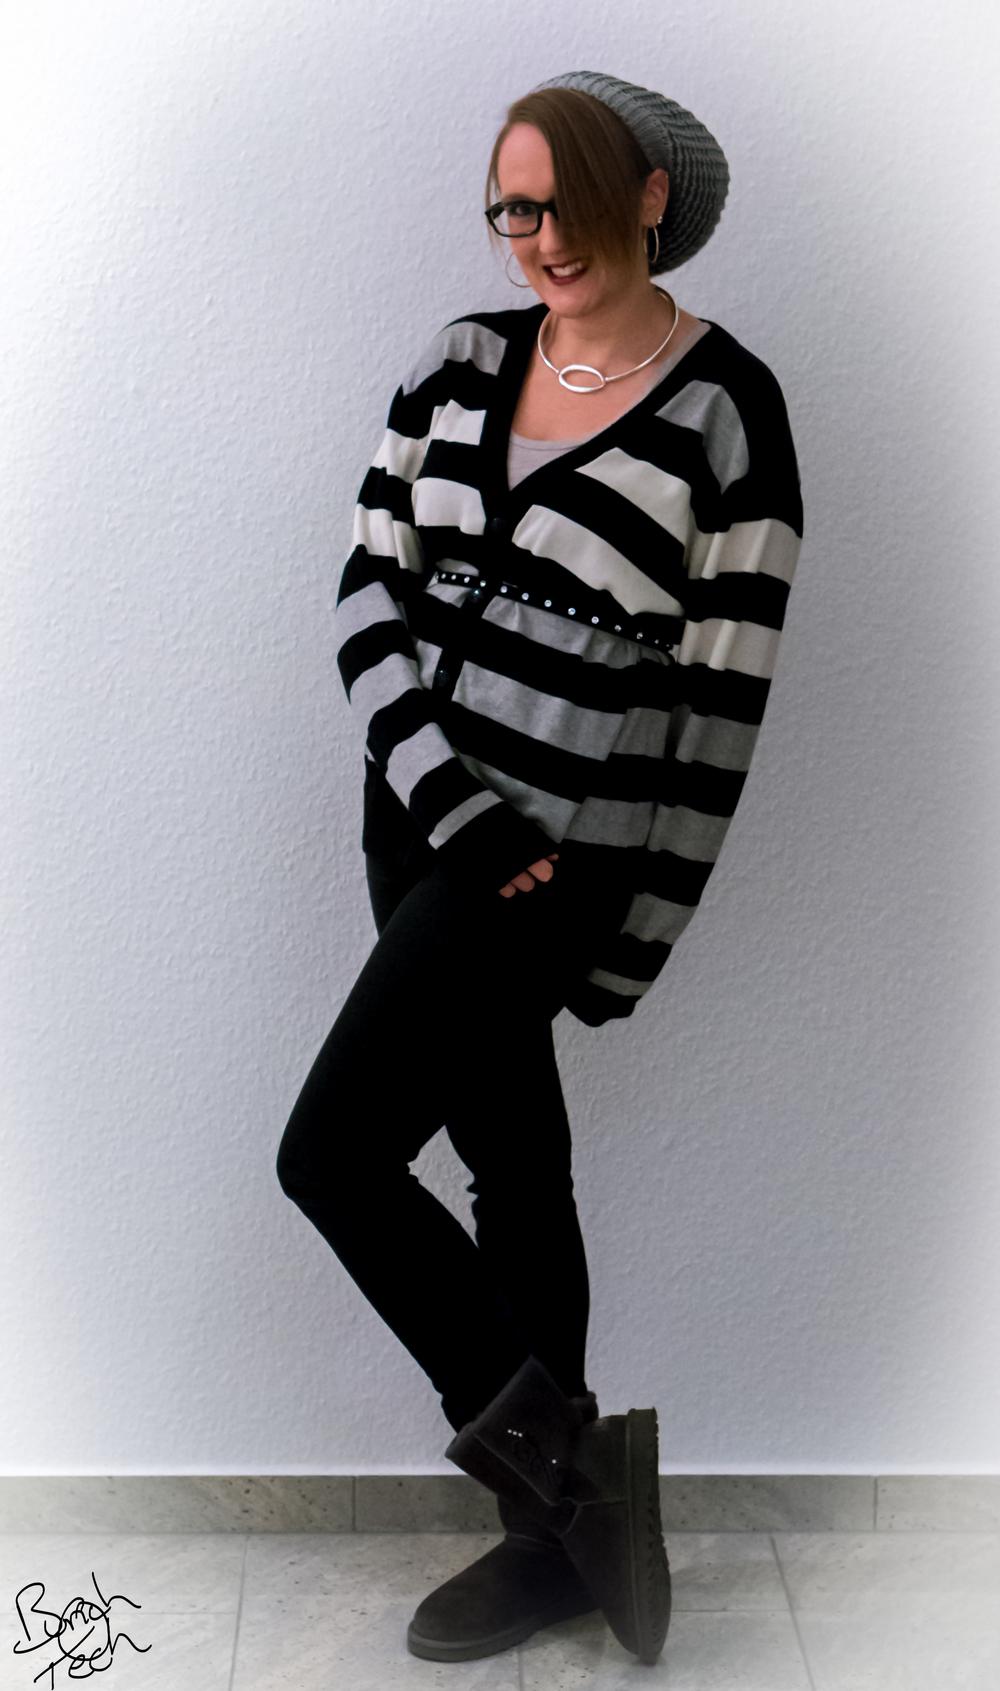 Amy-4-November 05, 2014.jpg